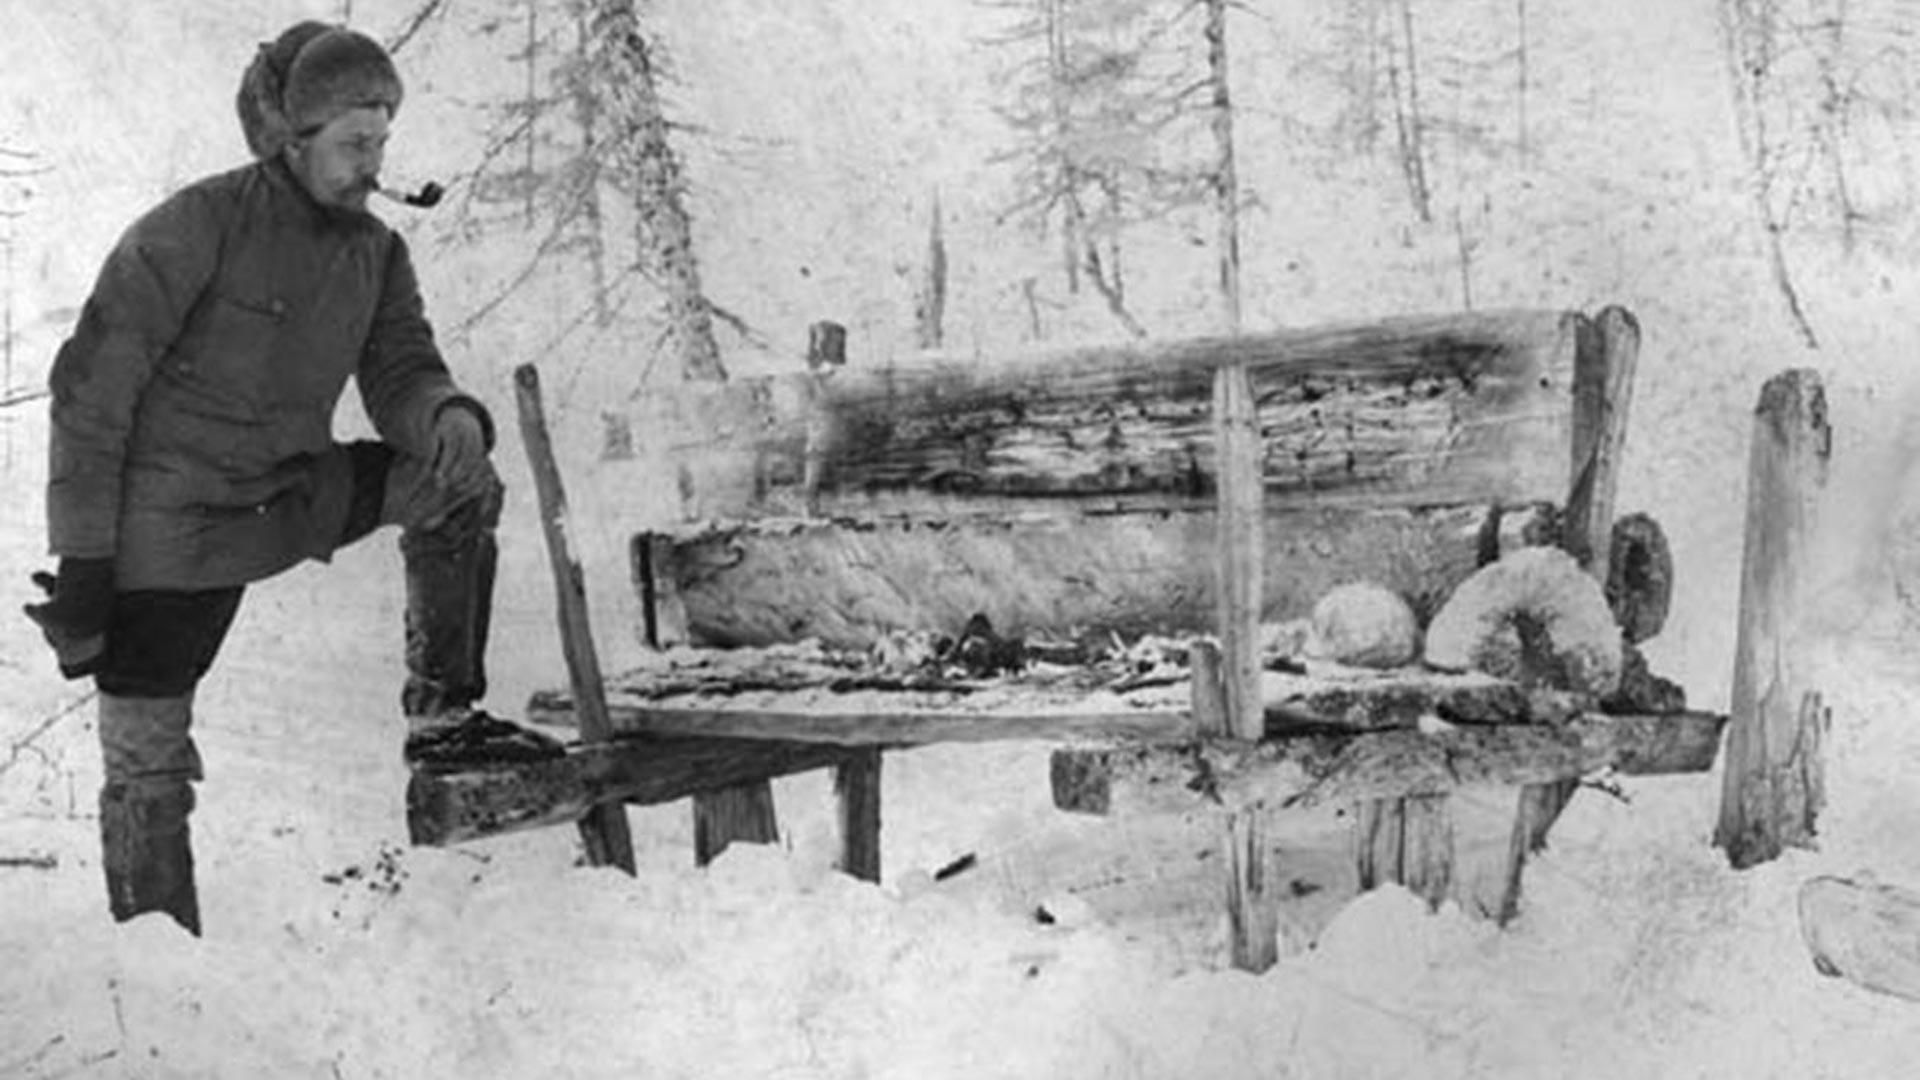 Ethnographer V. Vasilyev and a Yakut above-the-ground burial in Yenisey region, Siberia, 1905